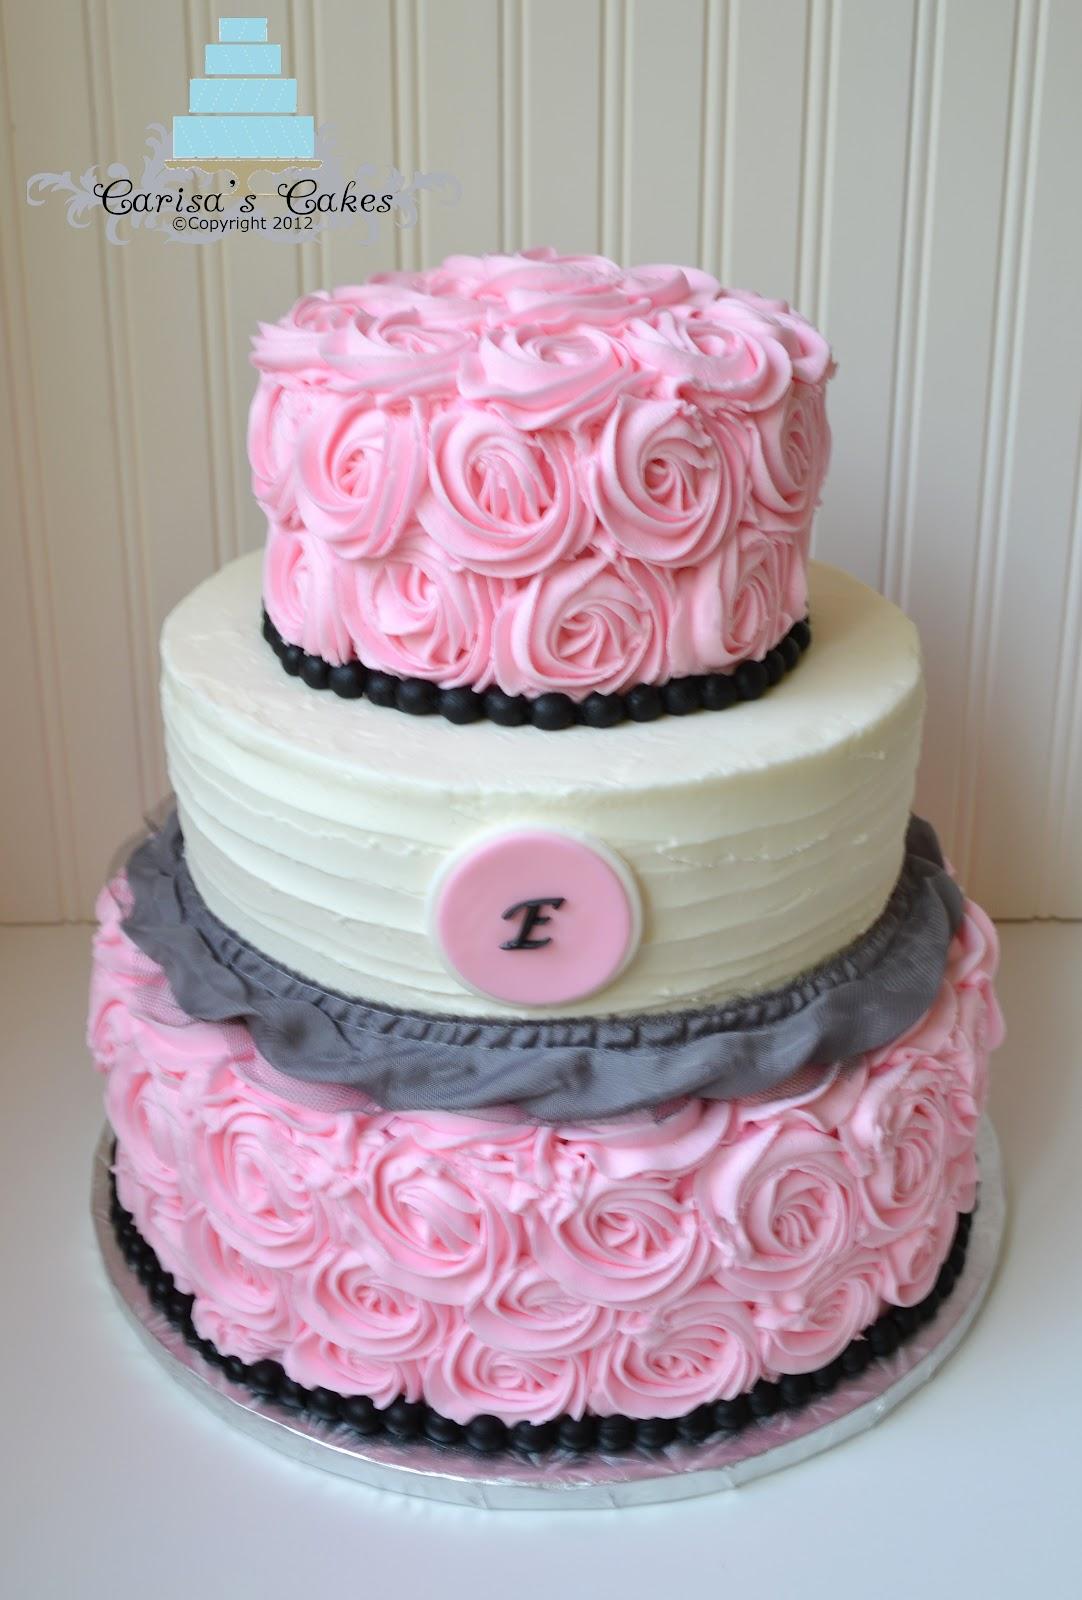 Carisa S Cakes October 2012